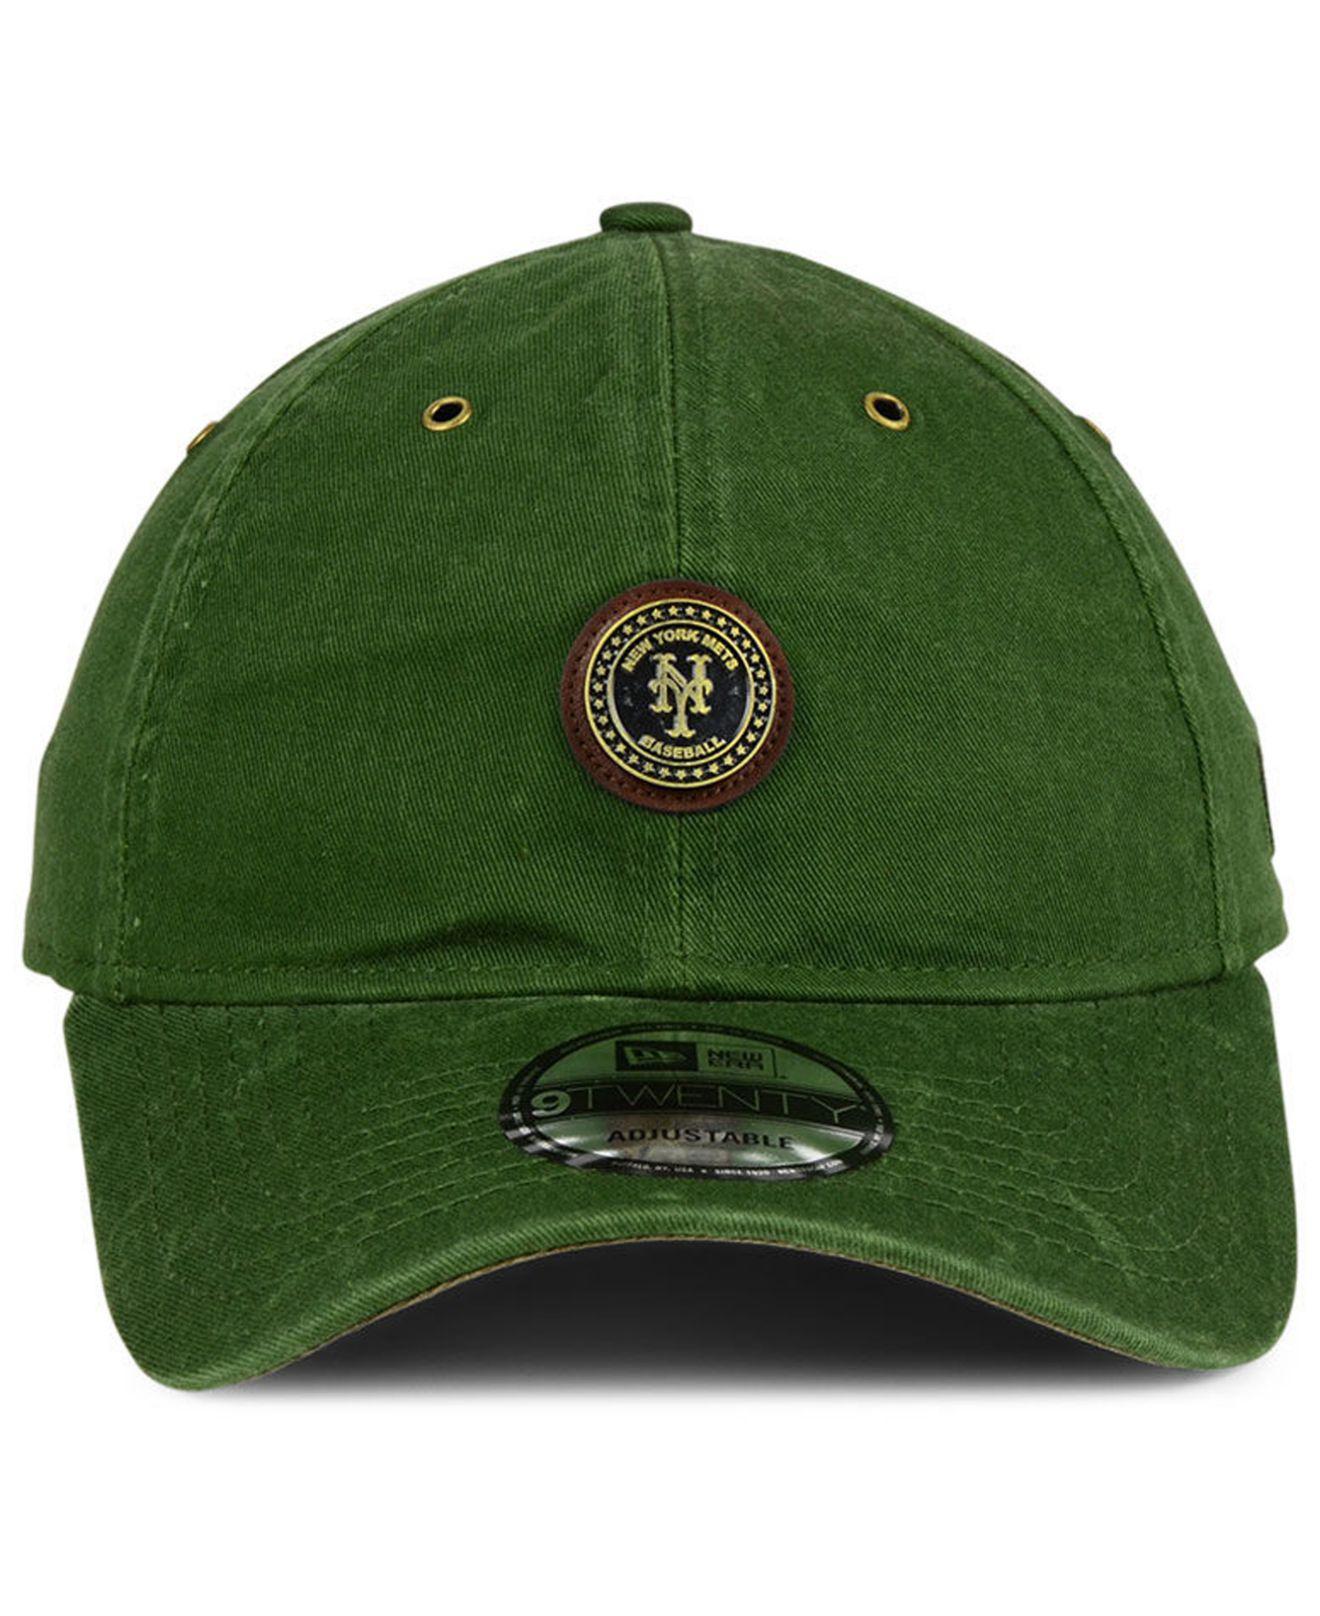 3ded229a3ad switzerland lyst ktz new york mets coin 9twenty cap in green for men 49edd  6852b